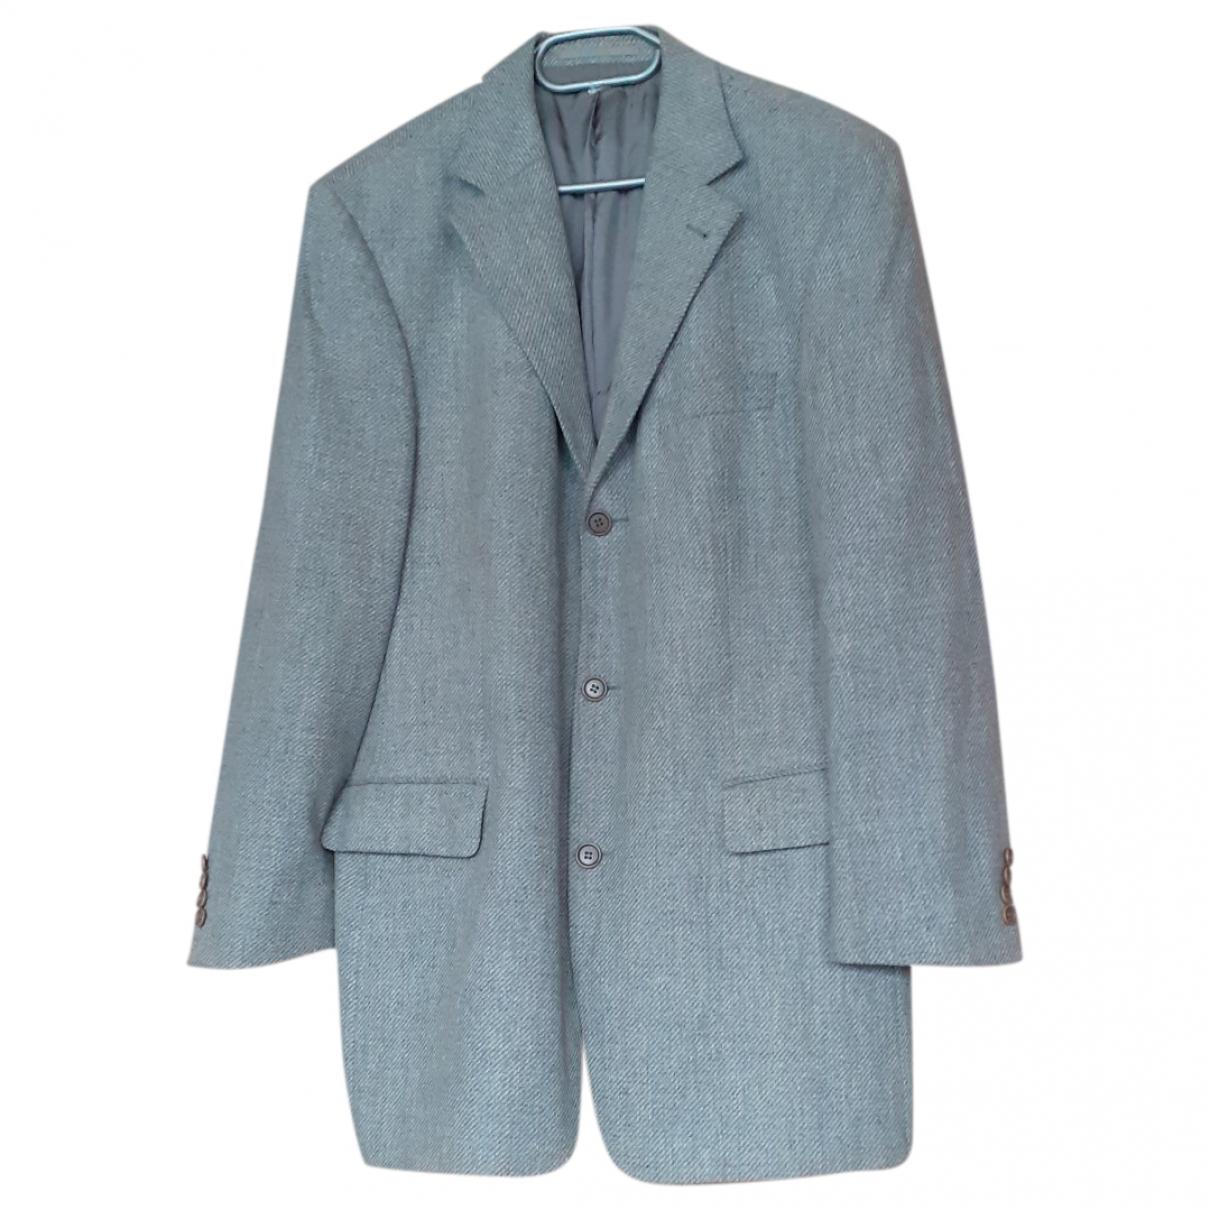 Boss \N Grey Wool jacket  for Men M International